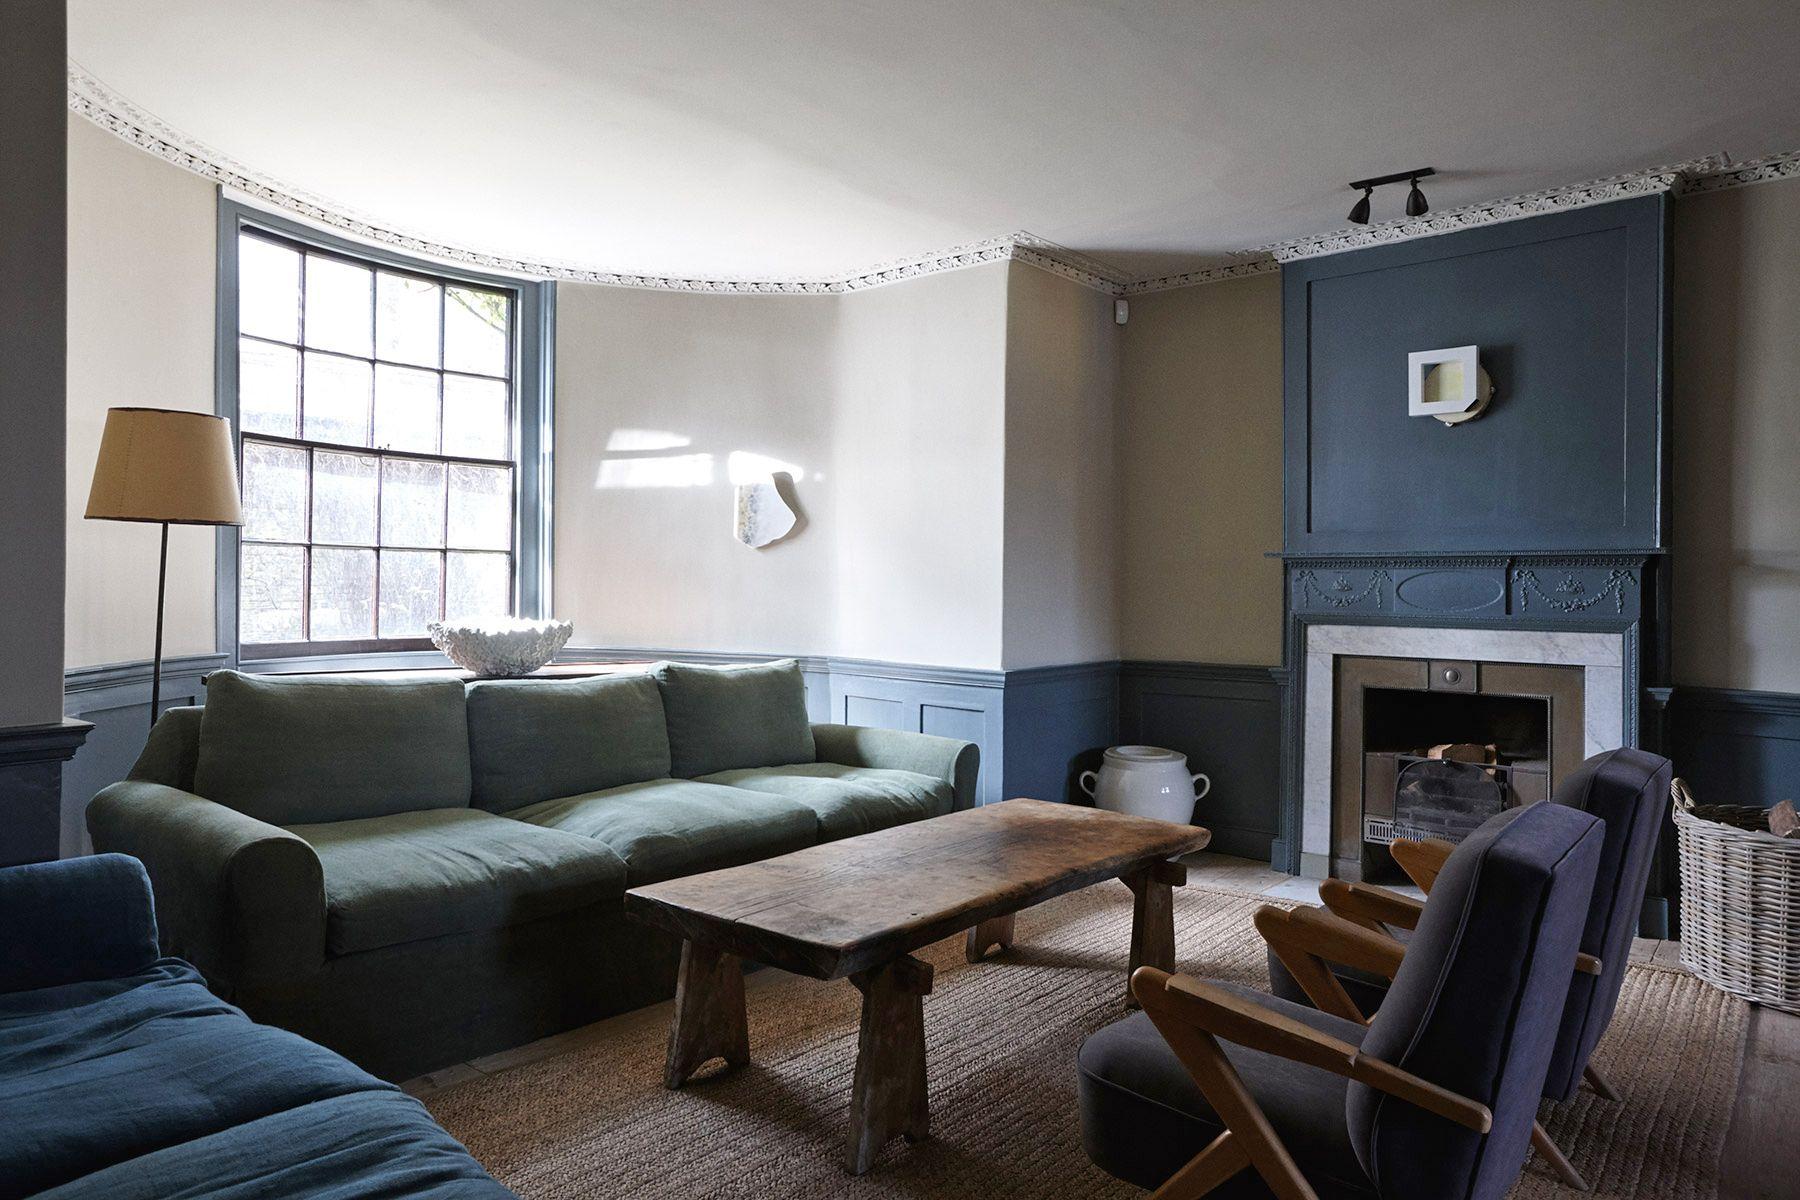 Londra: un Airbnb a 5 stelle – Foto – Living Corriere | Londra ...